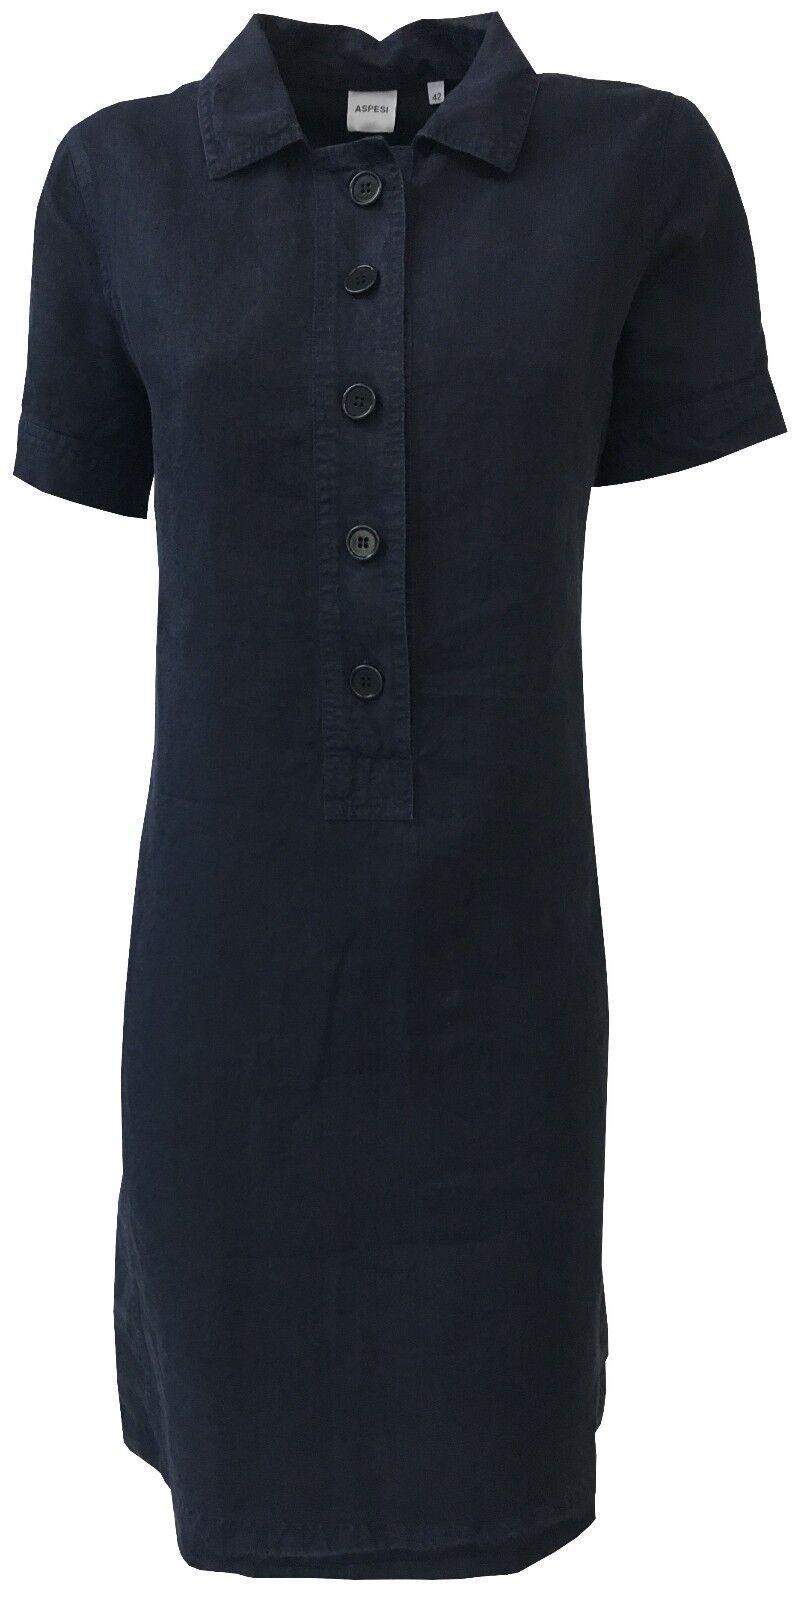 ASPESI  vestido mujer azul media manga modelo H605 C253 100% lino  toma